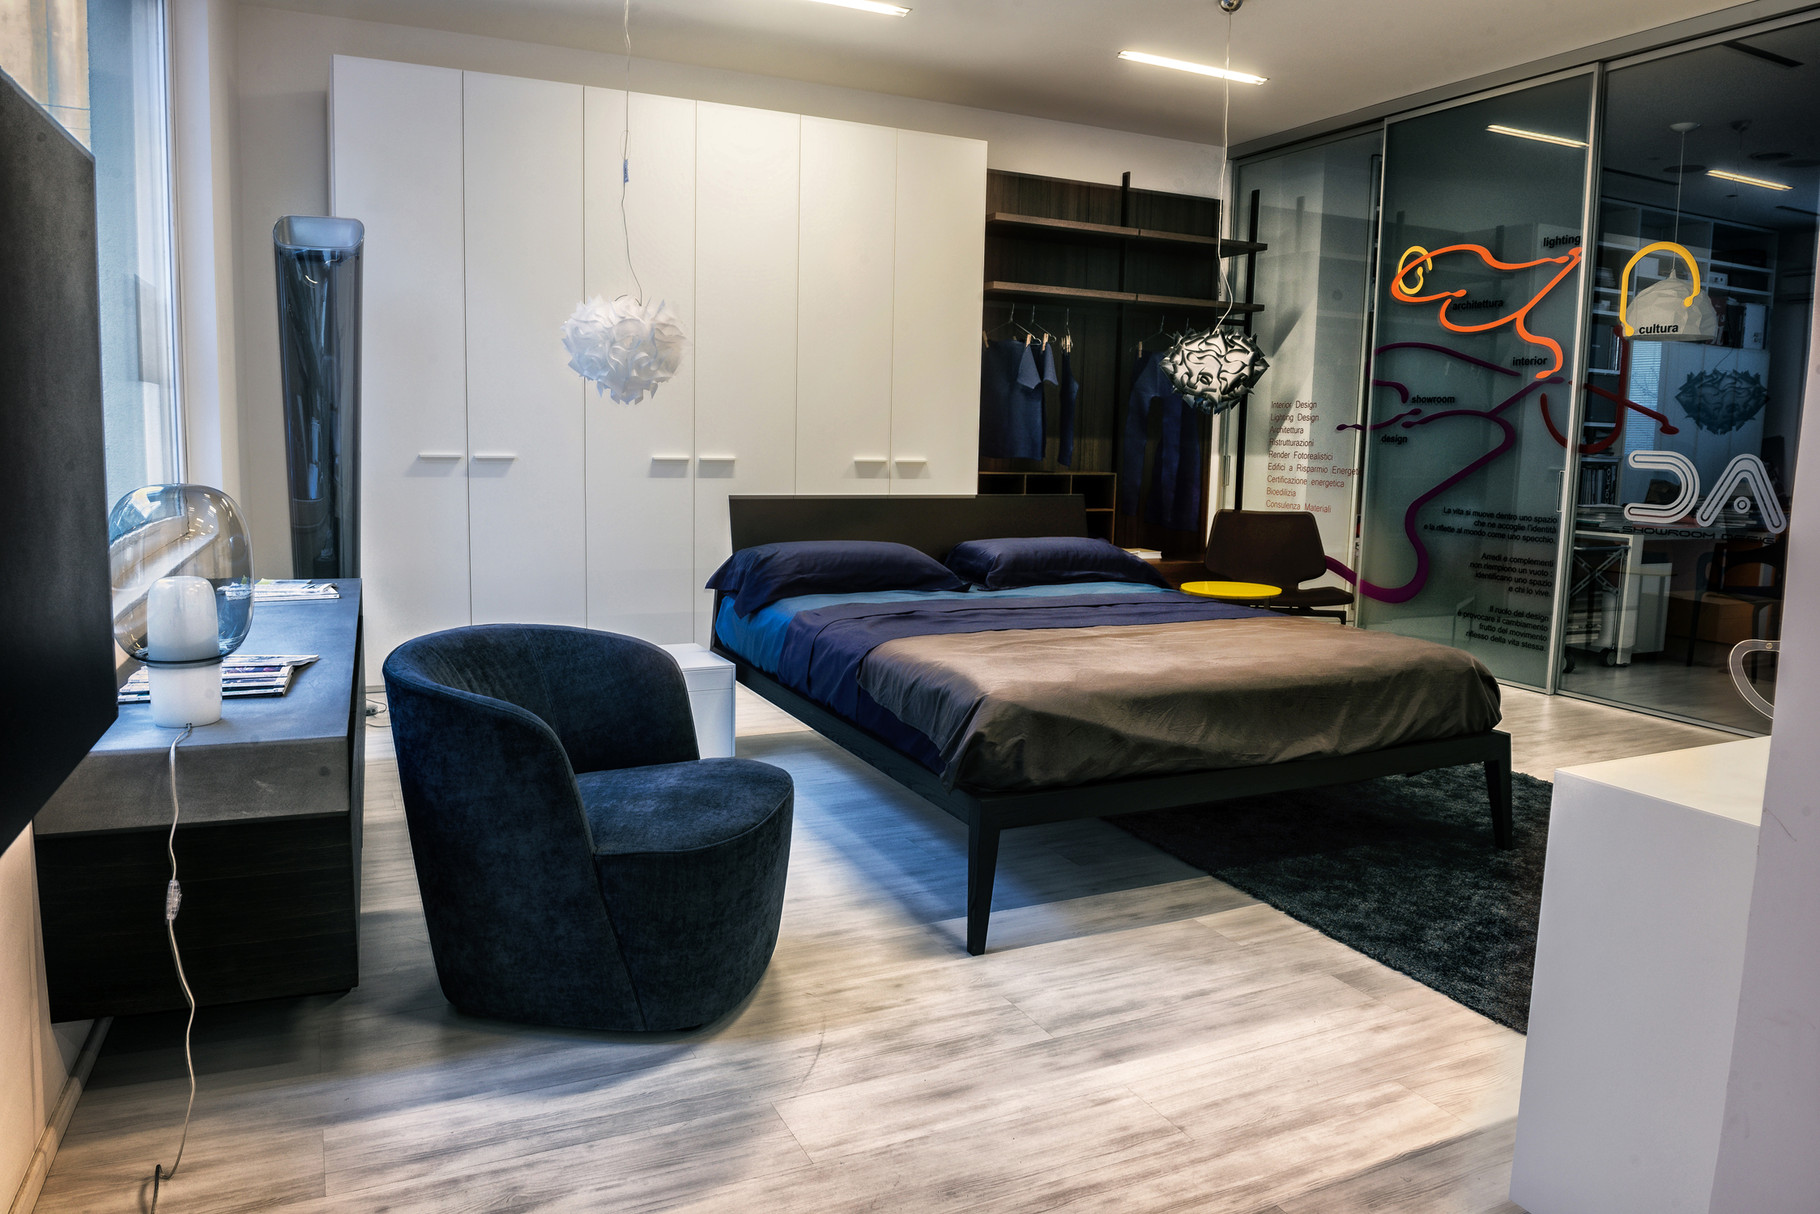 Arredamenti e mobili di design da interni s a s for Casa tua arredamenti